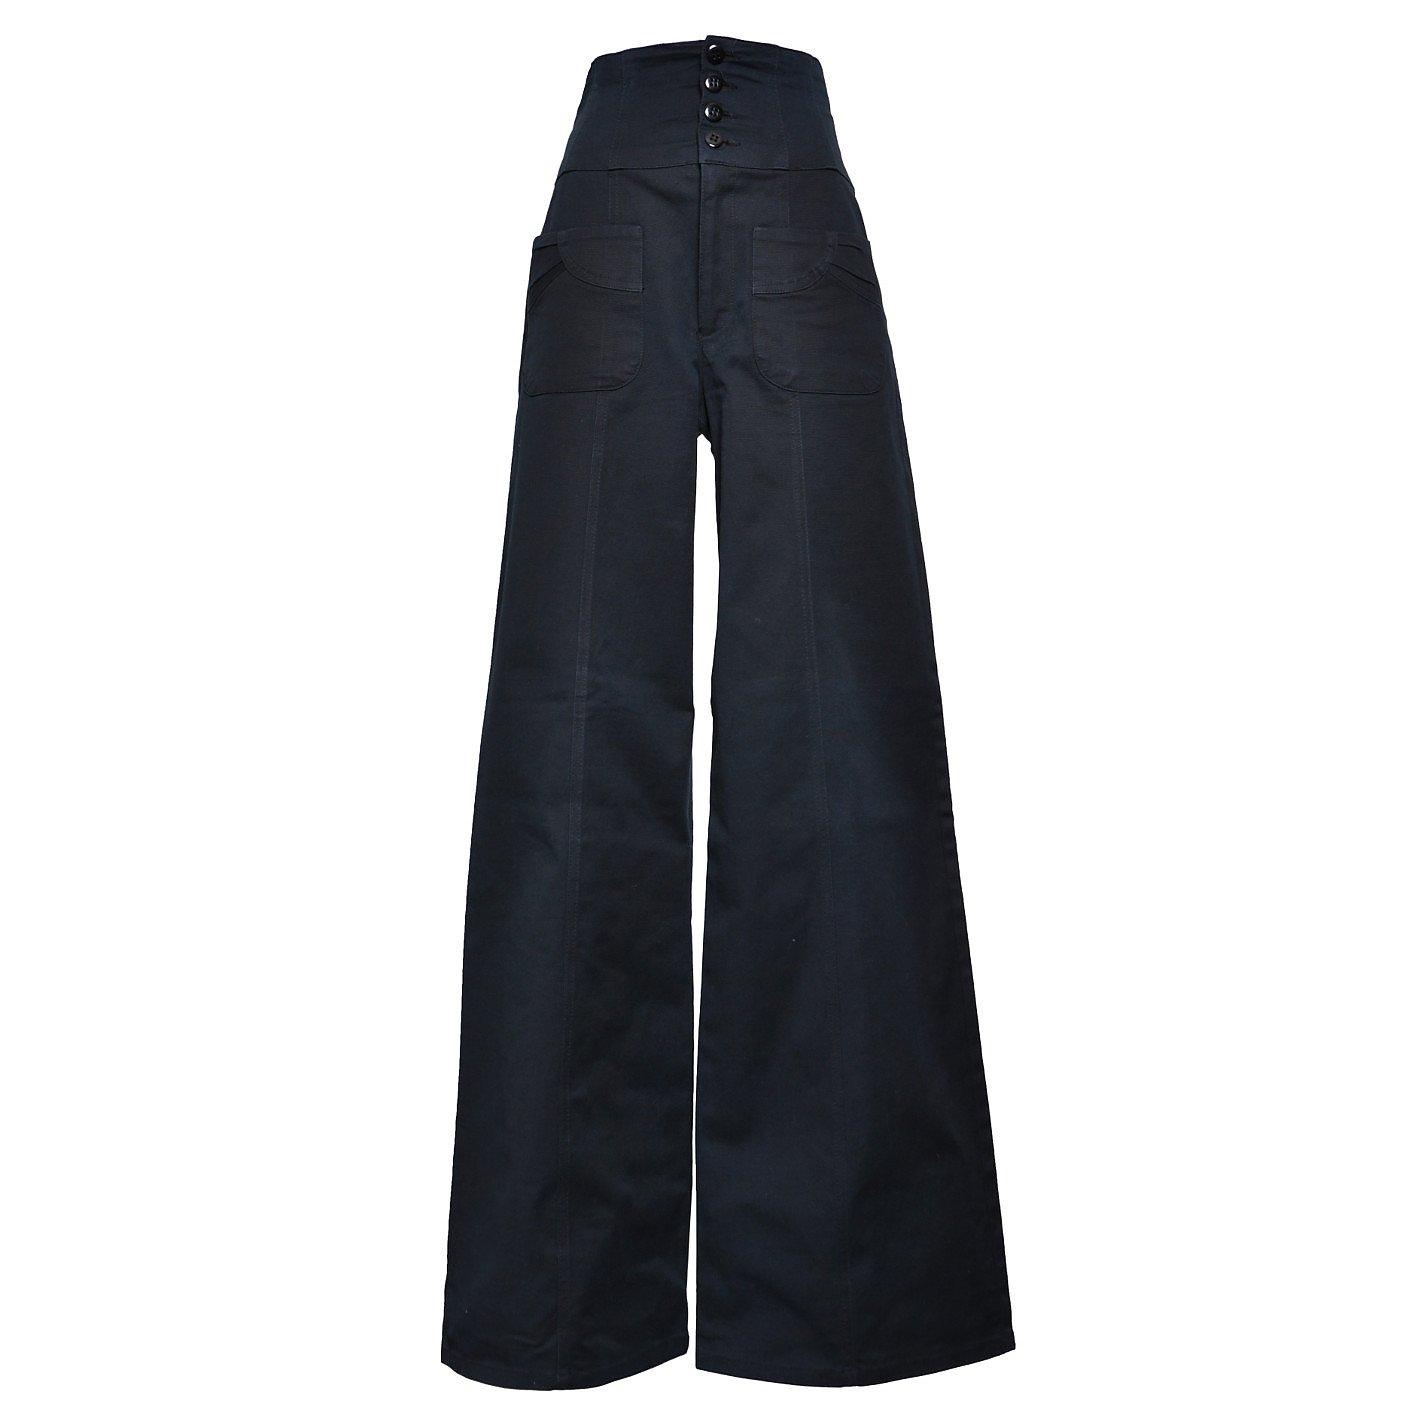 Nanette Lepore High-Waist Trousers